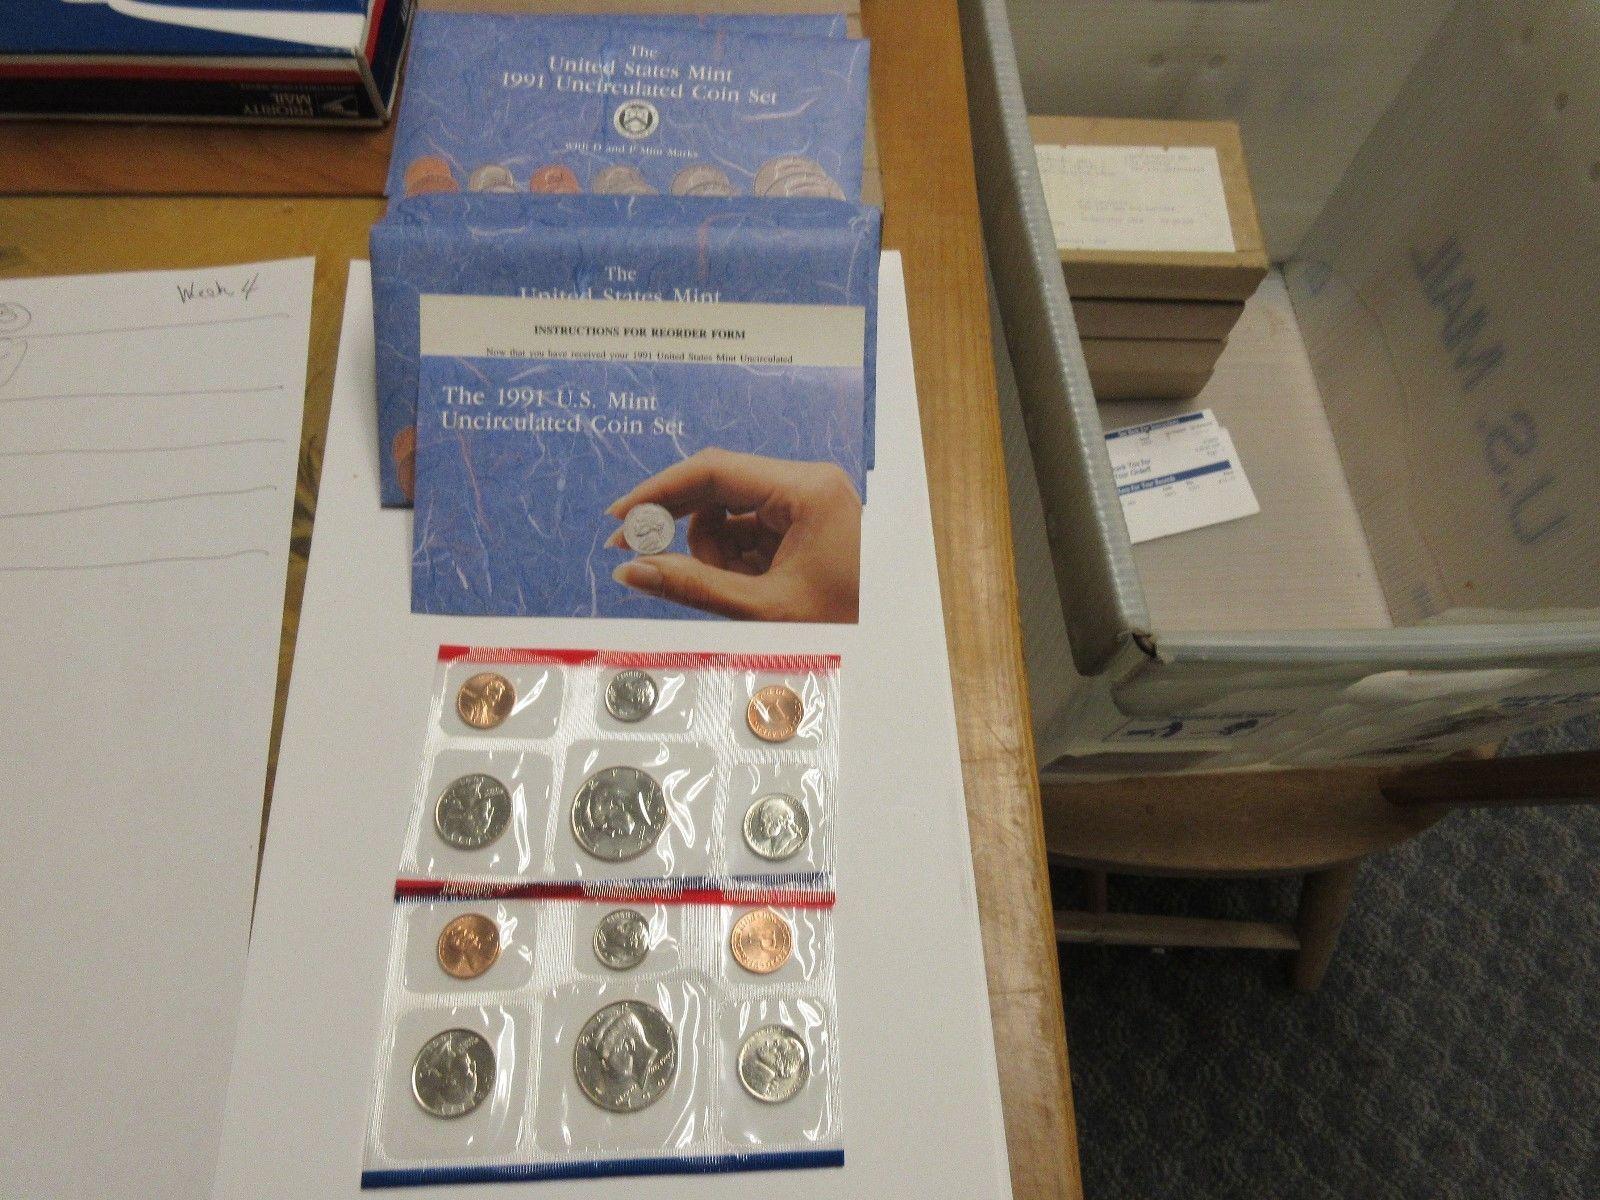 1991 , United States Mint , Uncirculated Mint Set , Lot of 5 Sets